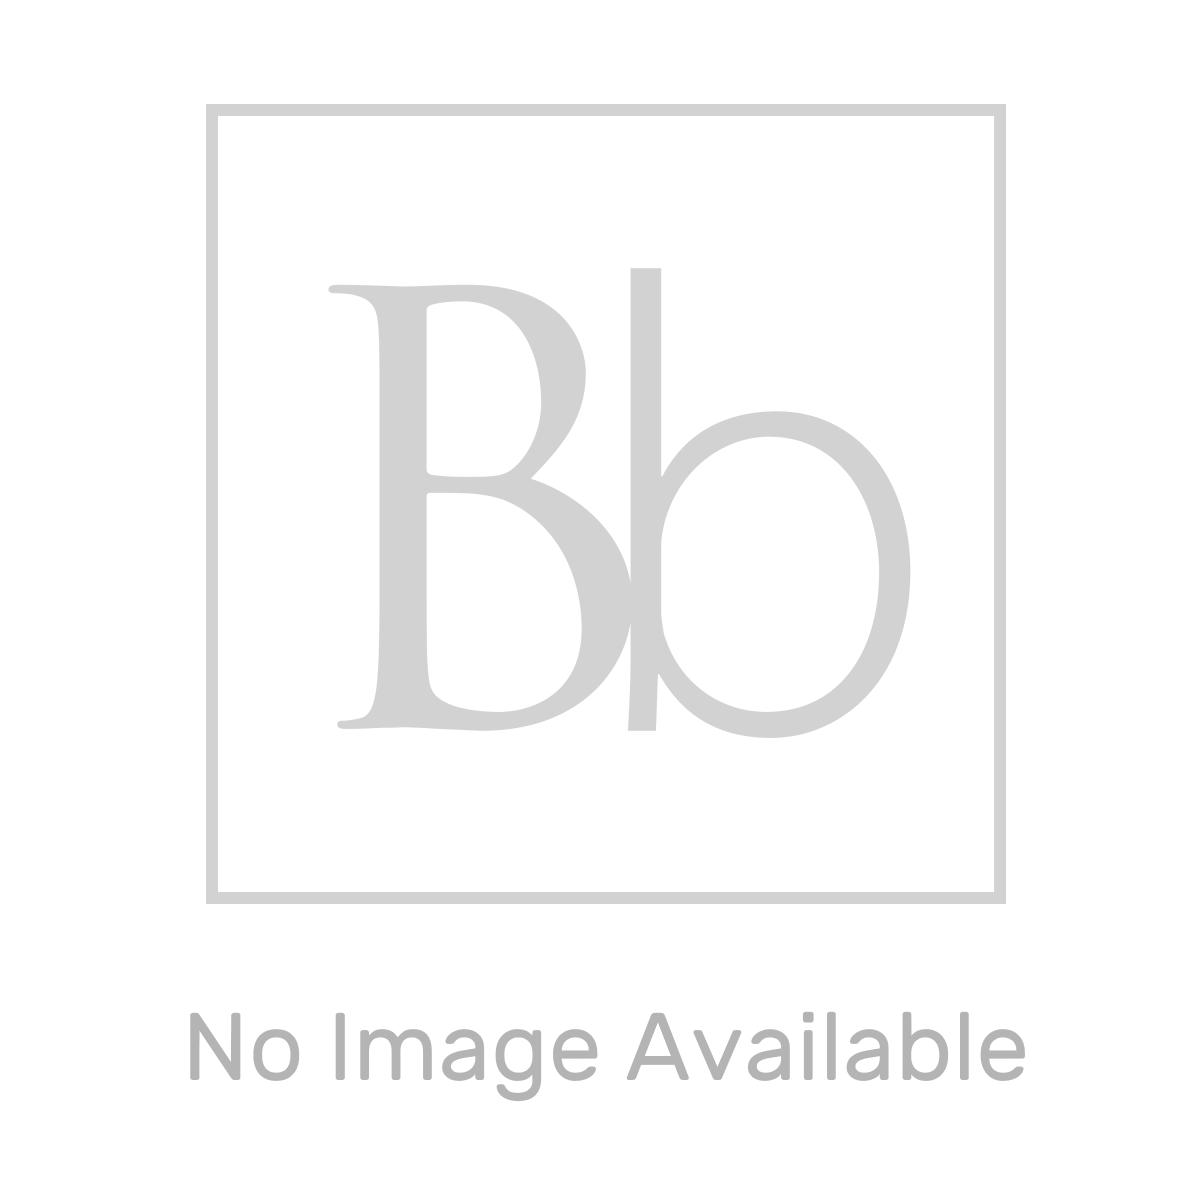 Sensio Astrid Cluster Adjustable LED Spot Lights Lifestyle